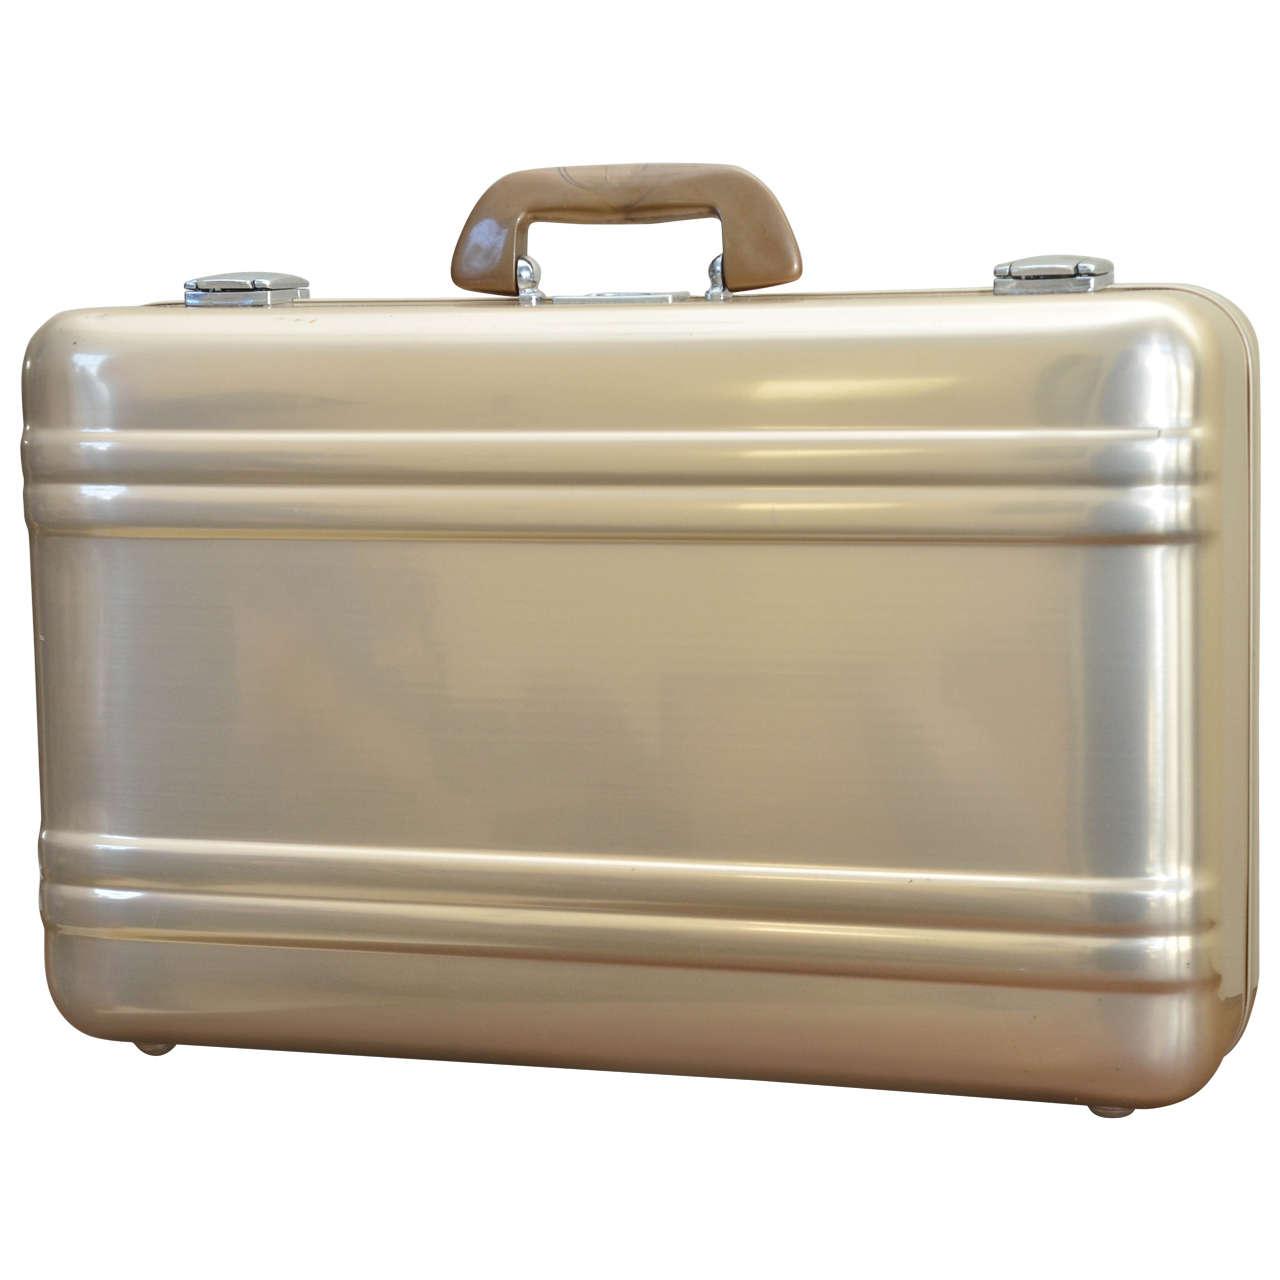 Norman Borlaug's Suitcase